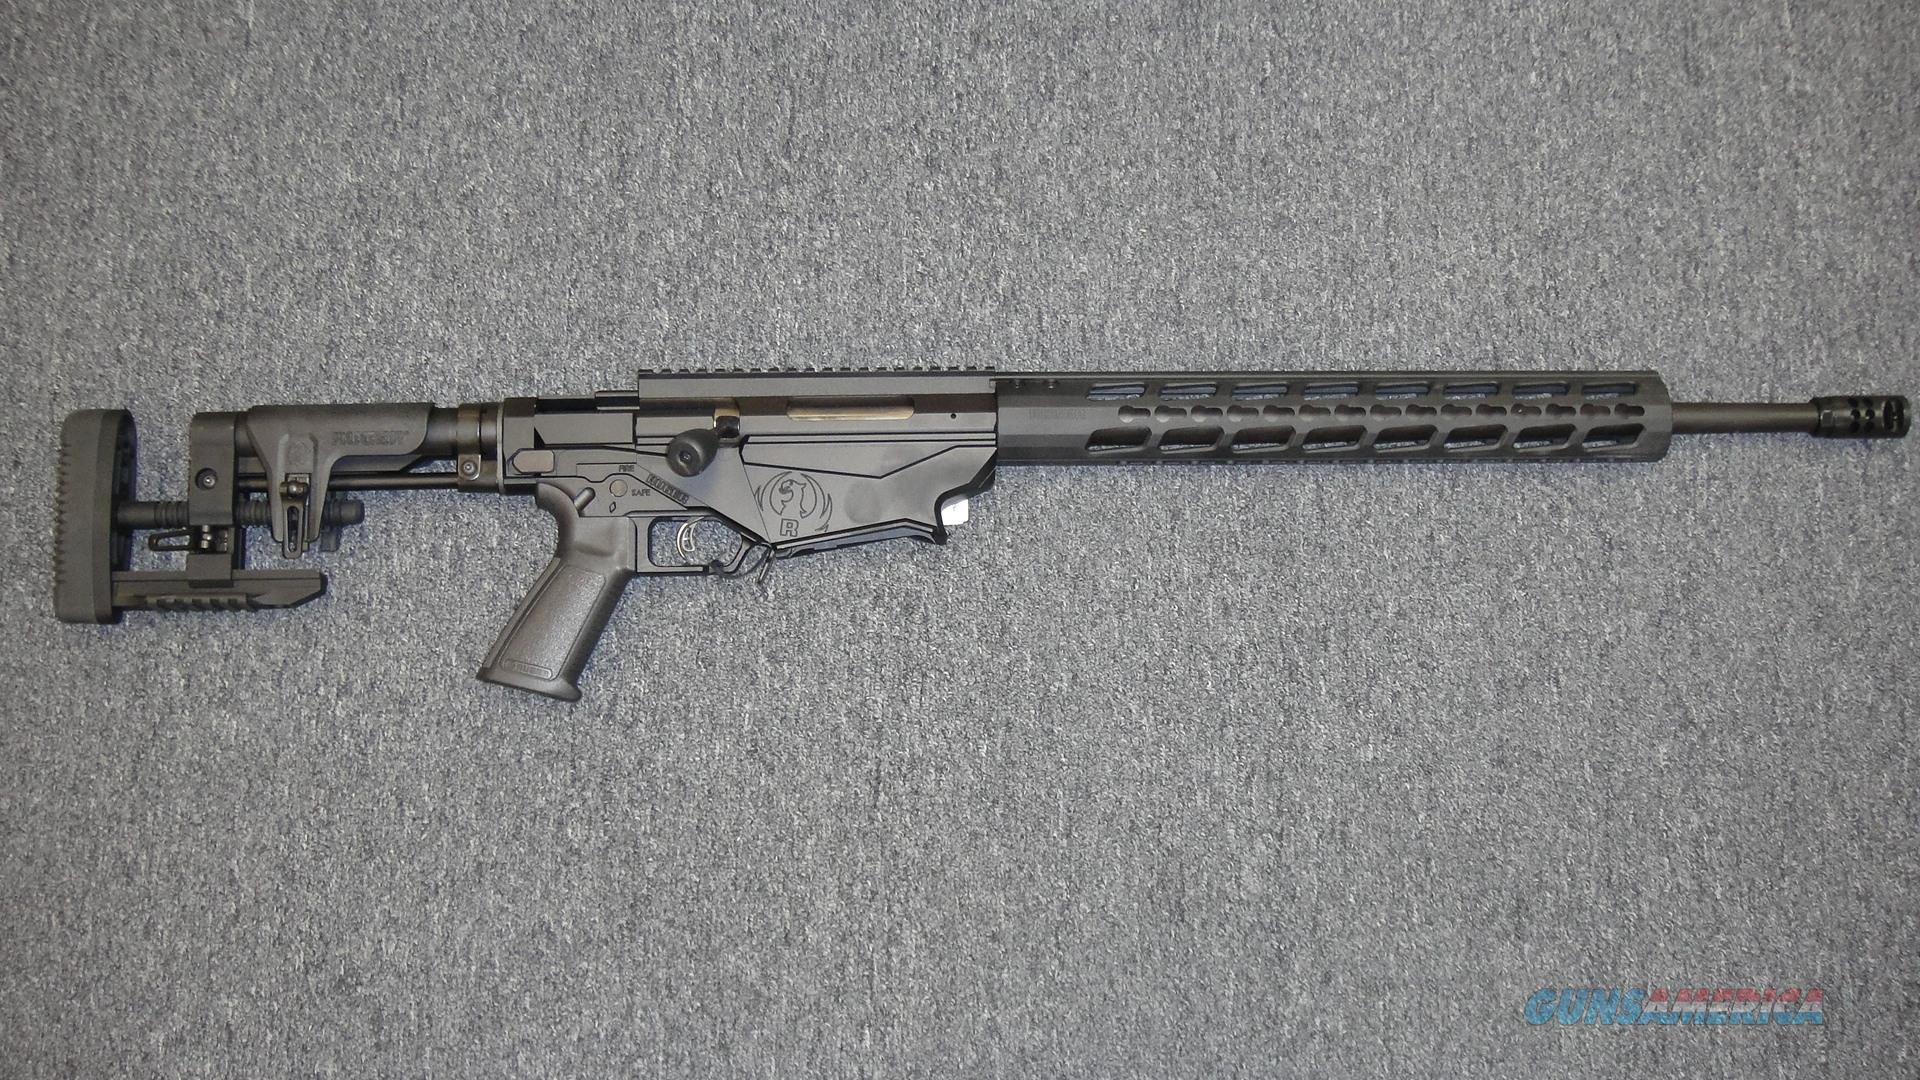 Ruger Precision 5.56 NATO  Guns > Rifles > Ruger Rifles > Precision Rifle Series